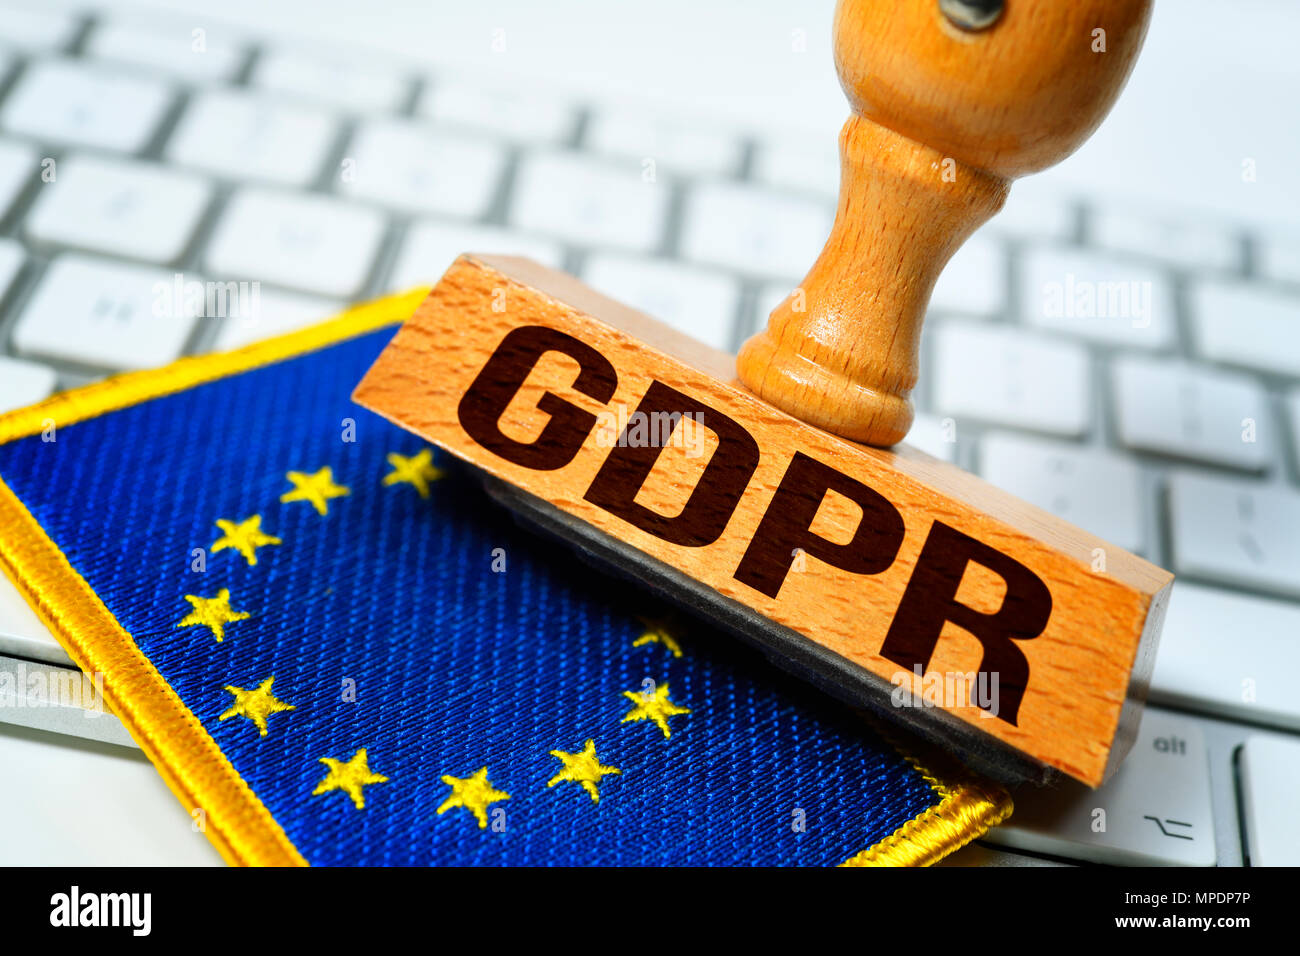 GDPR stamp, General Data Protection Regulation - Stock Image